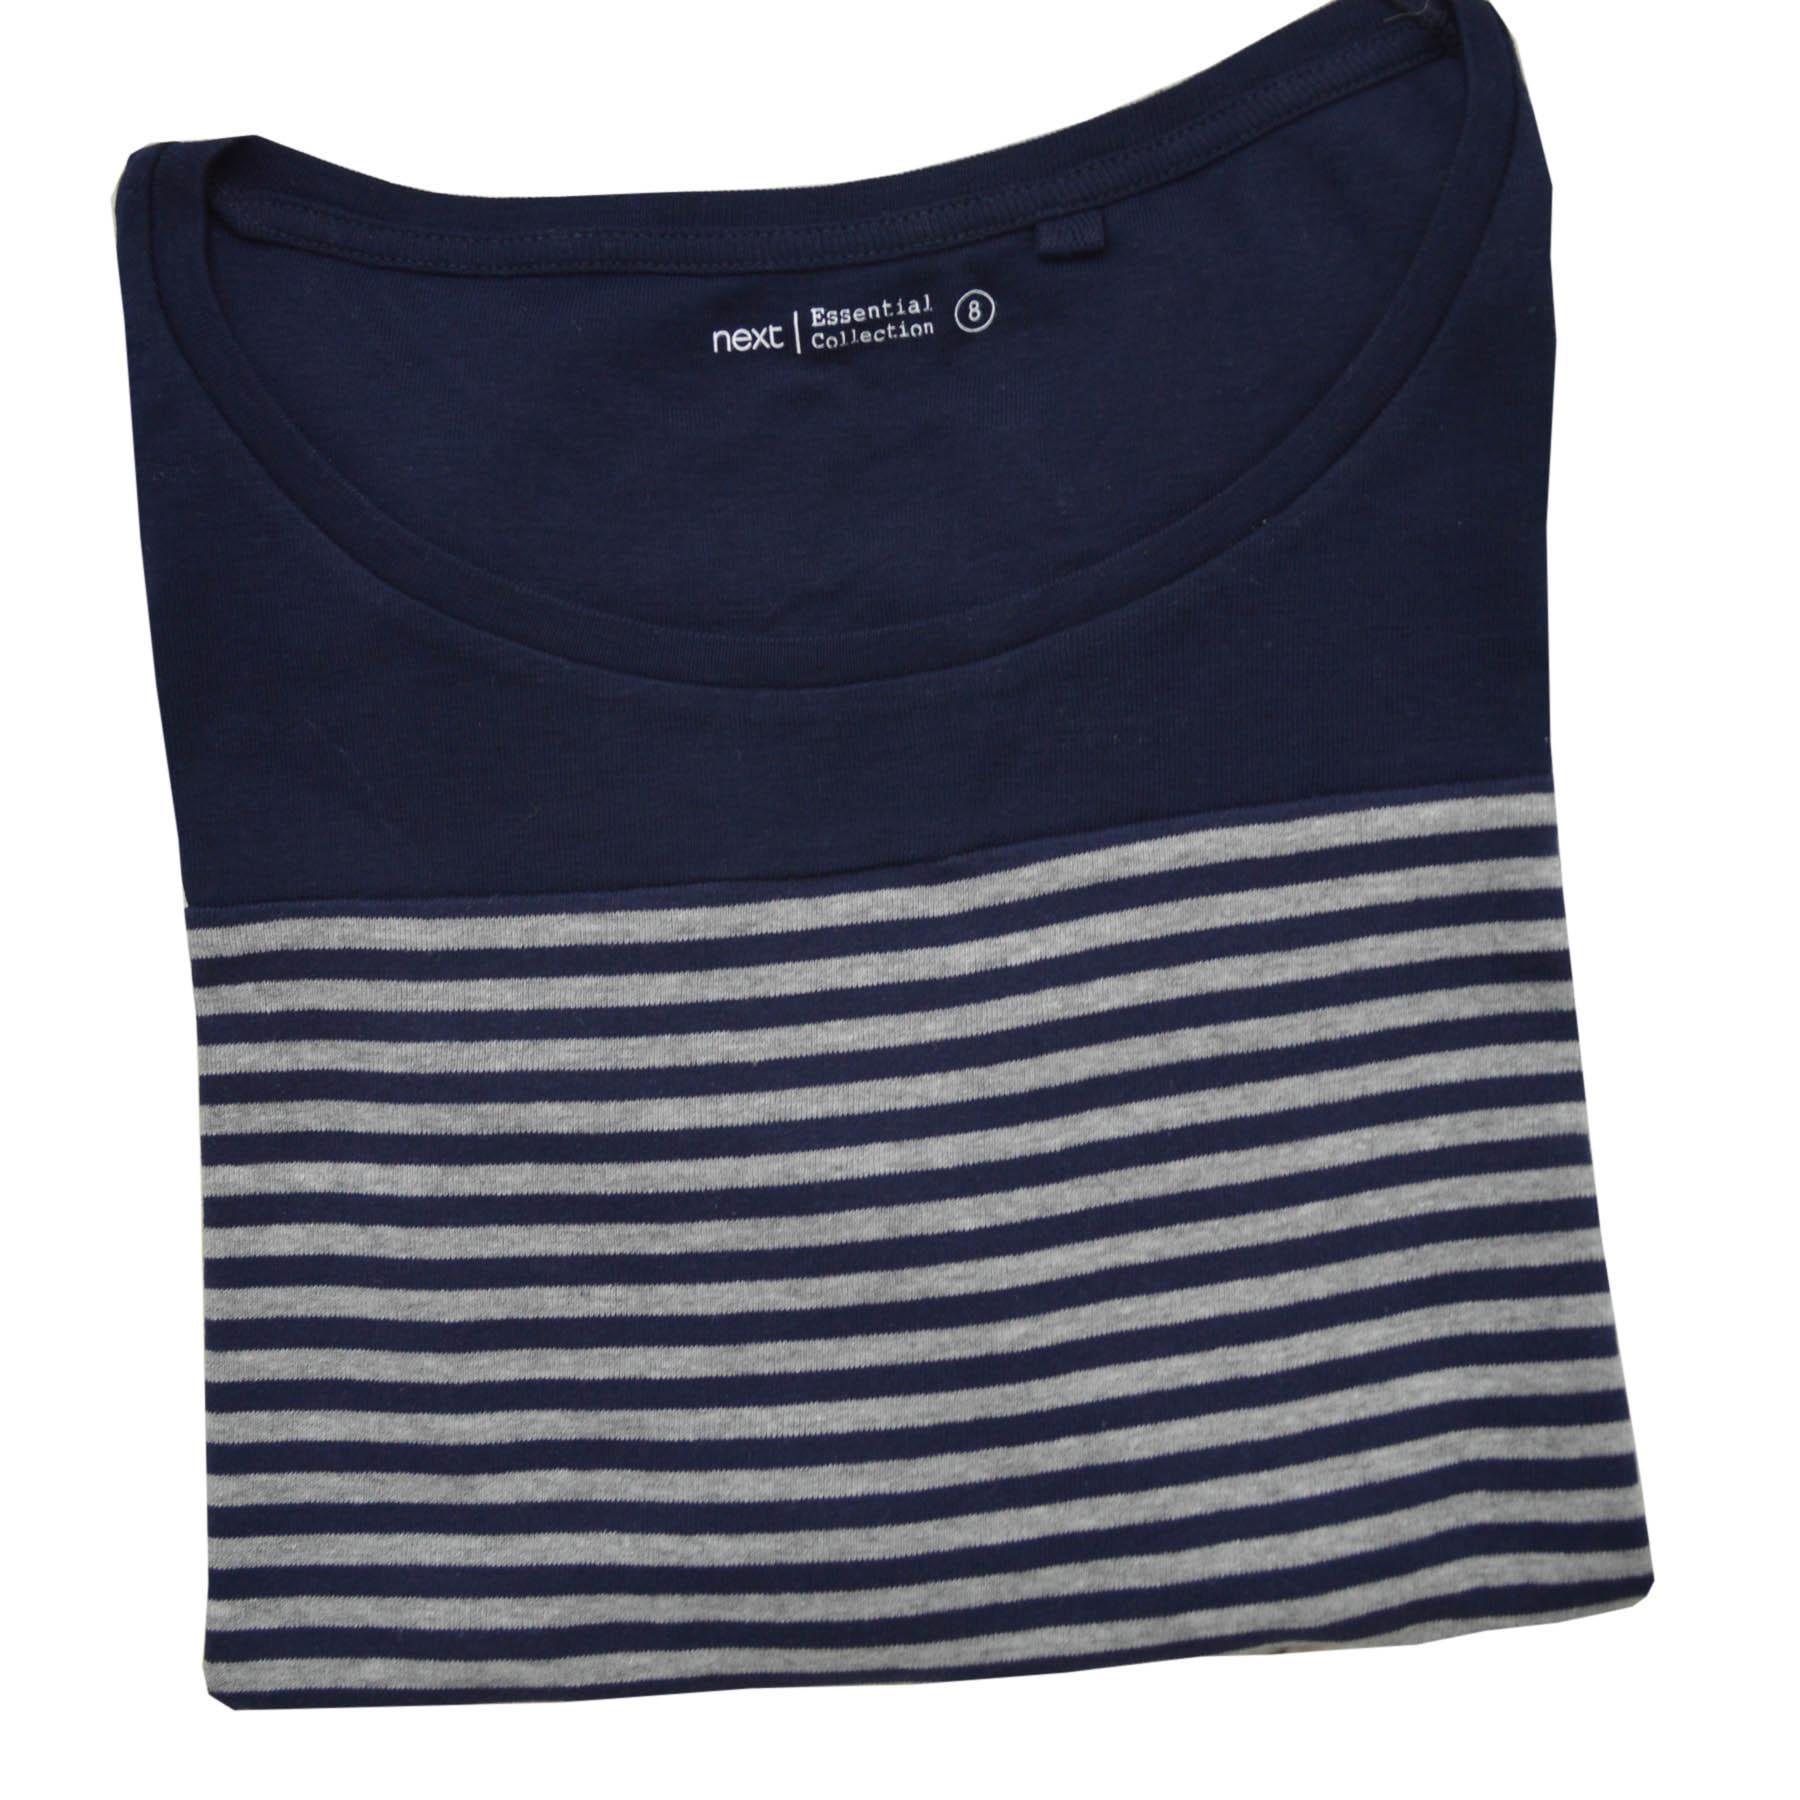 Femmes-a-Rayures-T-shirt-manches-longues-haut-en-jersey-col-rond-kaki-ou-Bleu-marine-Taille-6-24 miniature 10